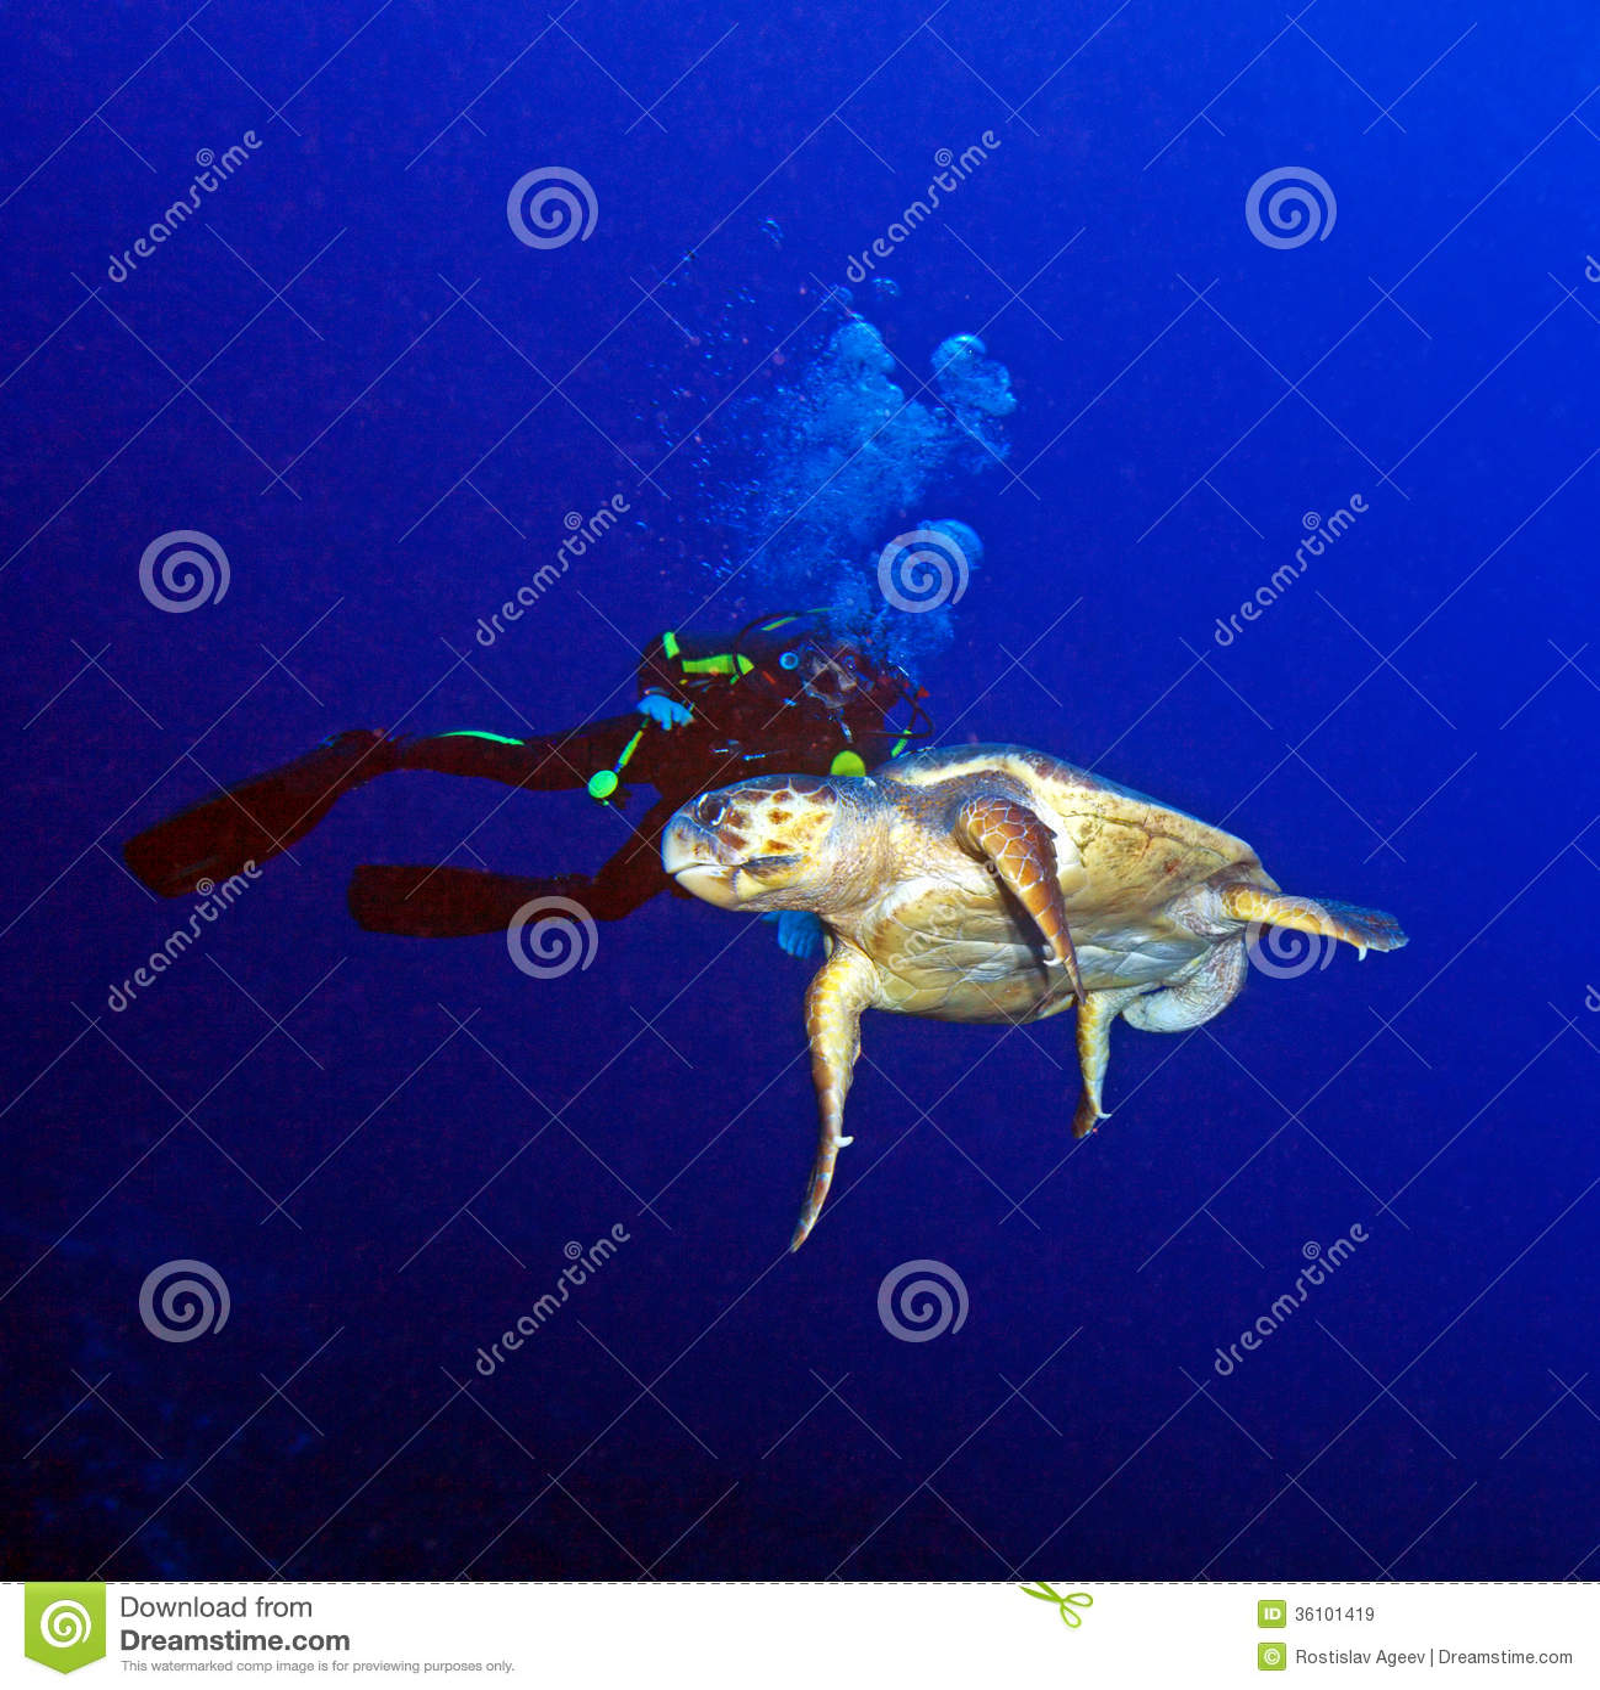 Green Turtle and Scuba Diver